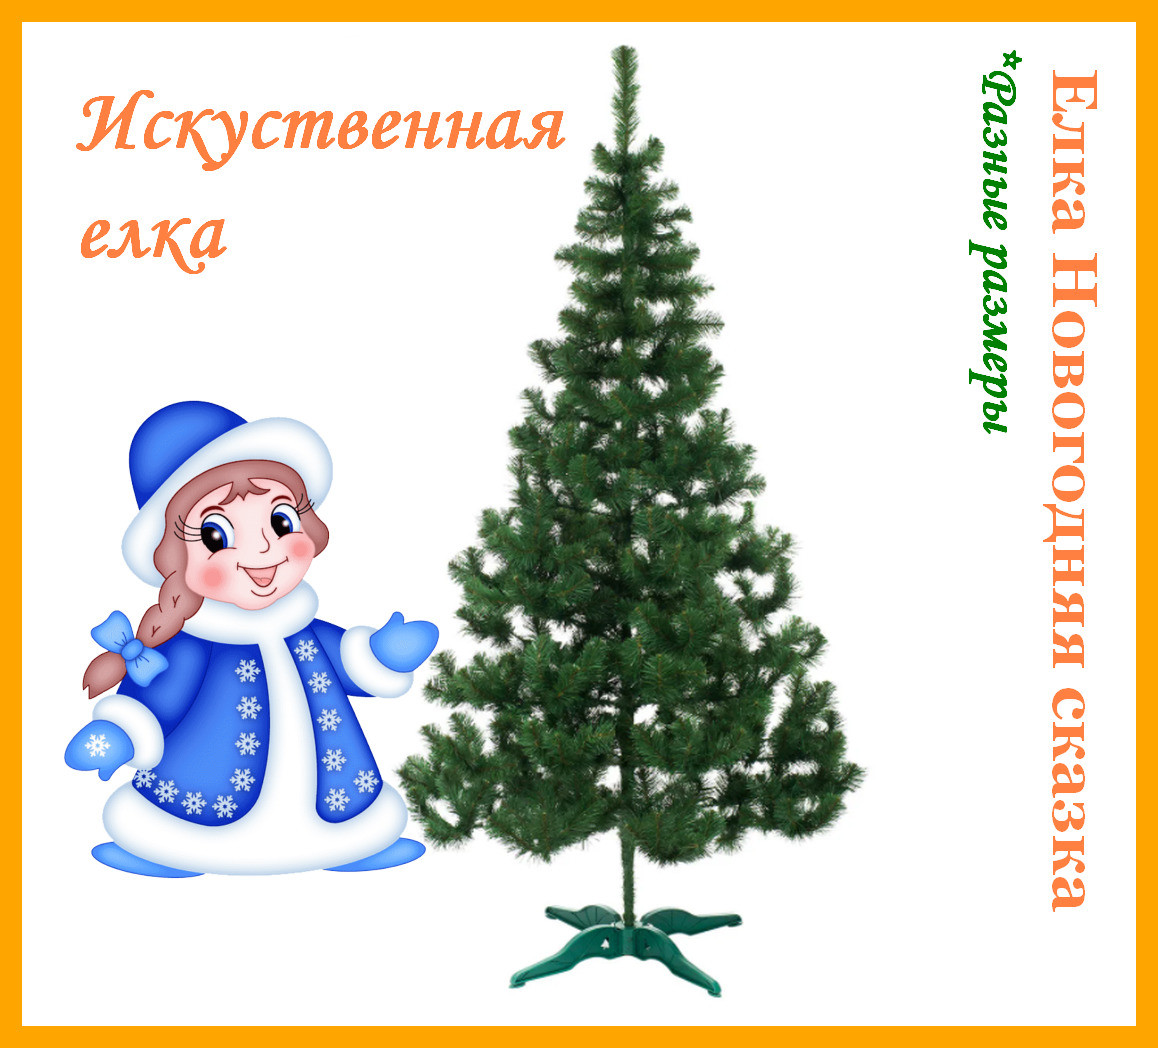 ЕЛЬ штучне ПВХ 2,2 м Штучна ЯЛИНКА новорічна КАЗКА 2.2 метра Ялинка новорічна 220см